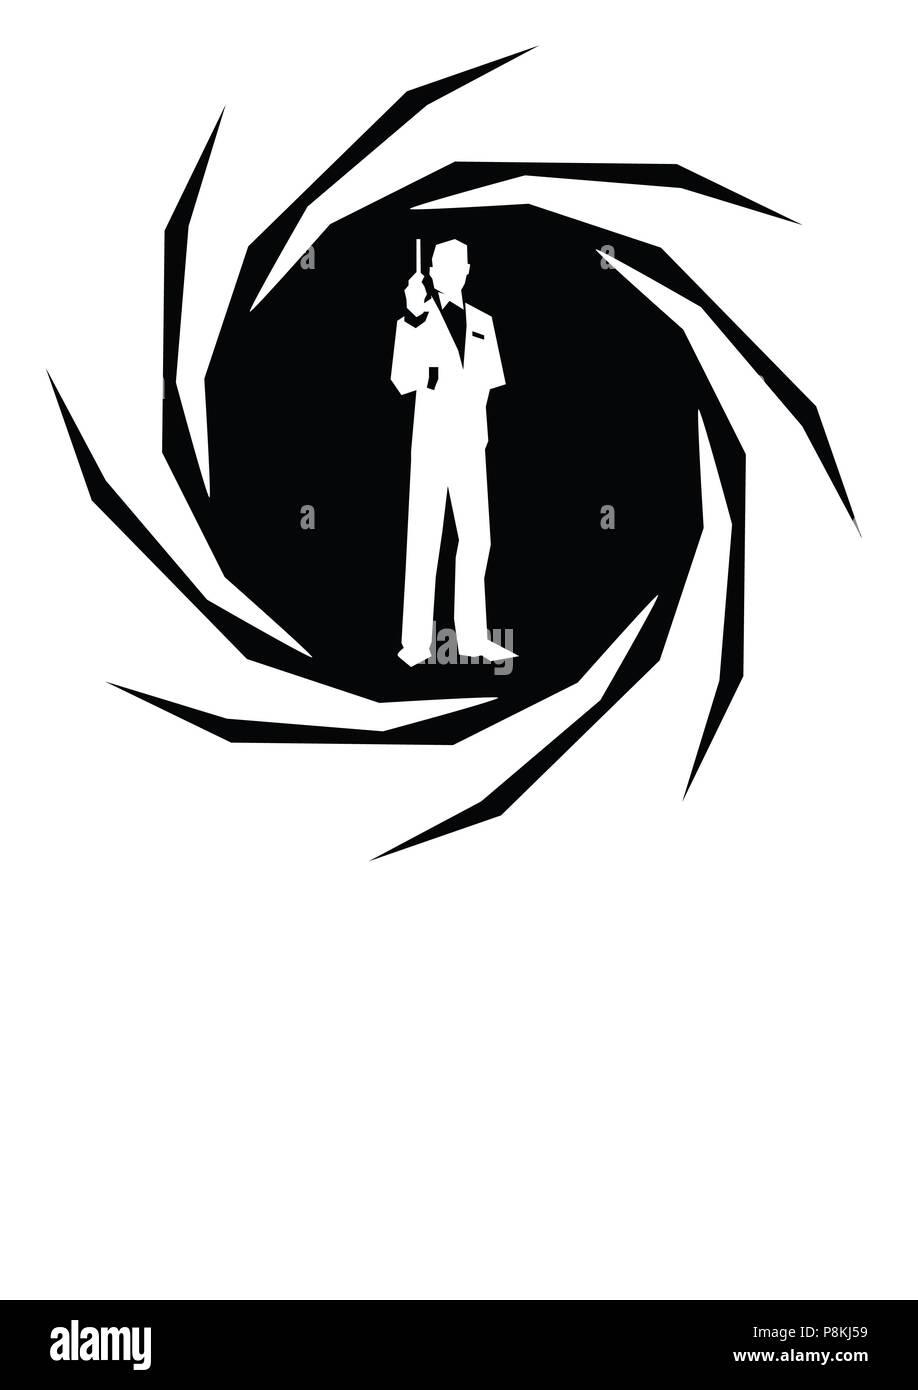 James Bond Character White Background Nice Illustration